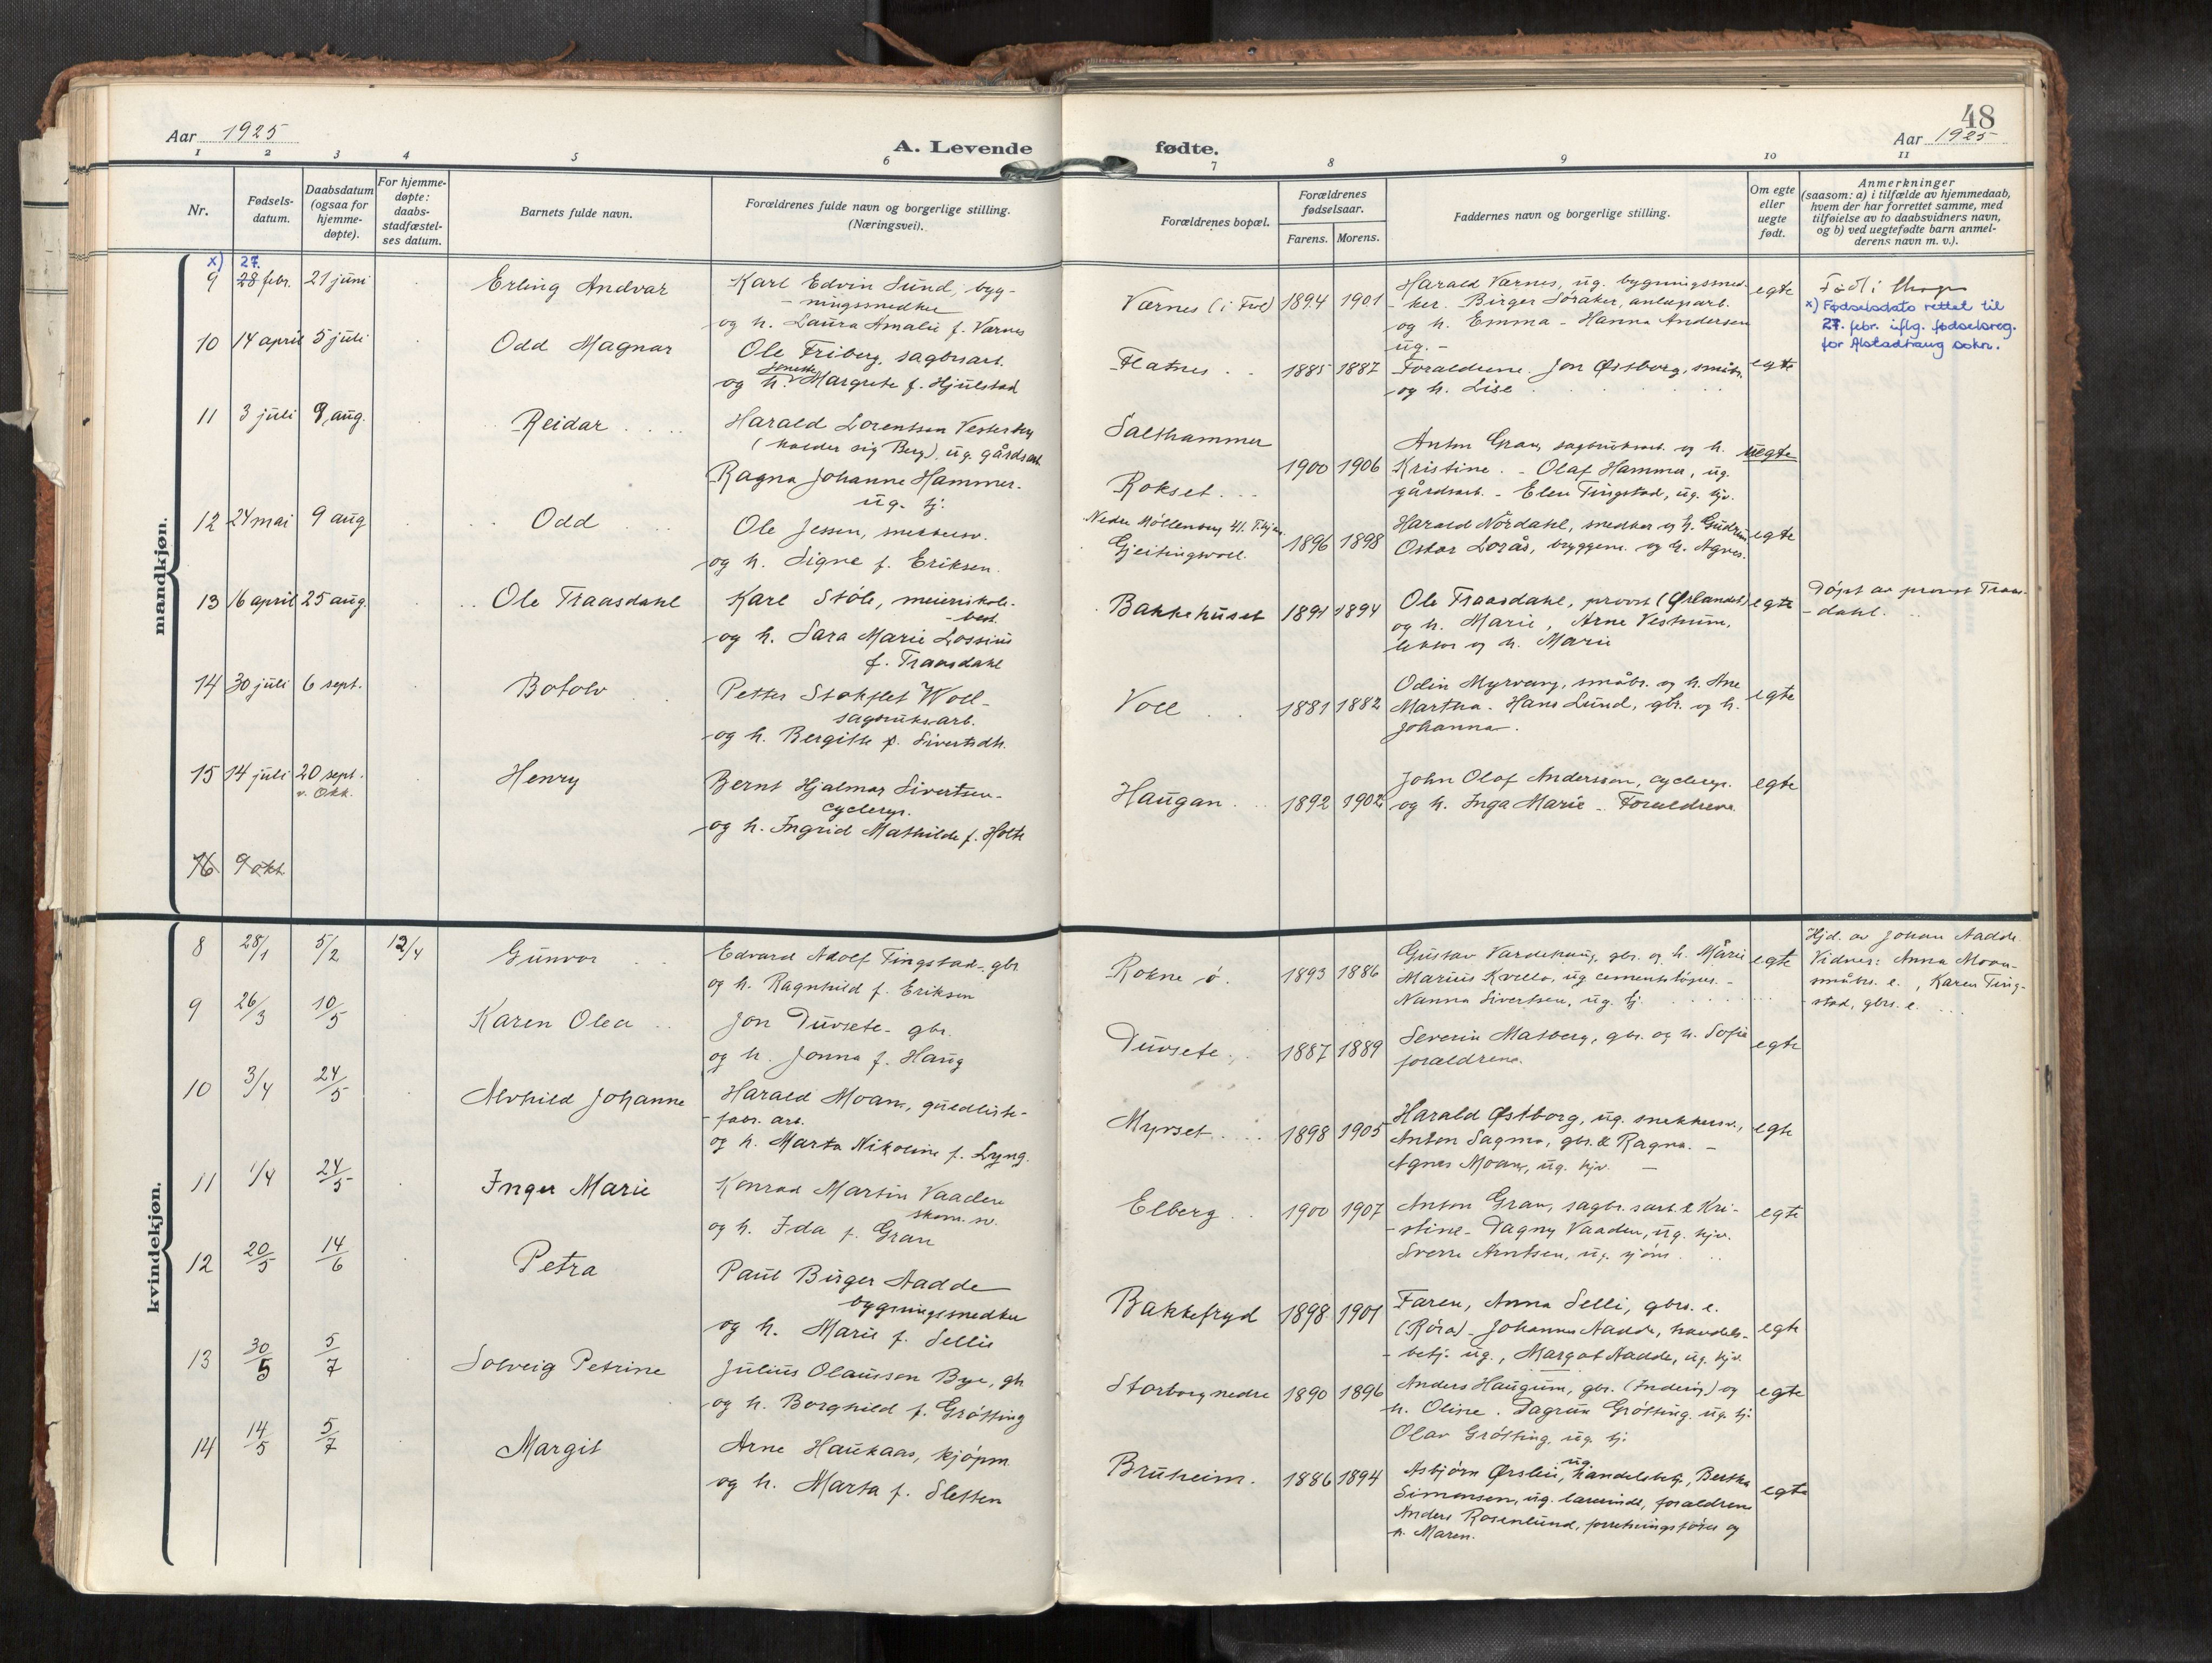 SAT, Levanger sokneprestkontor*, Parish register (official) no. 1, 1912-1935, p. 48